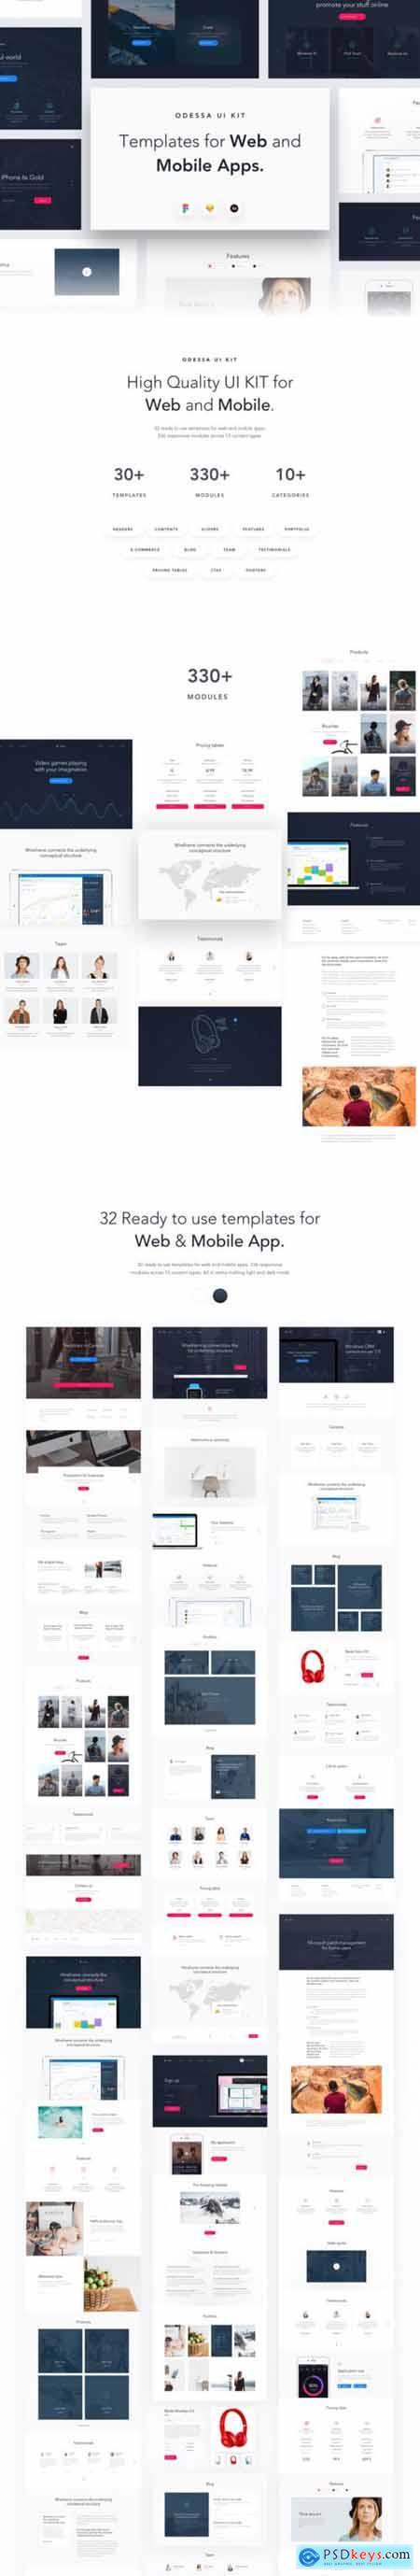 Odessa - Web & Mobile UI Kit